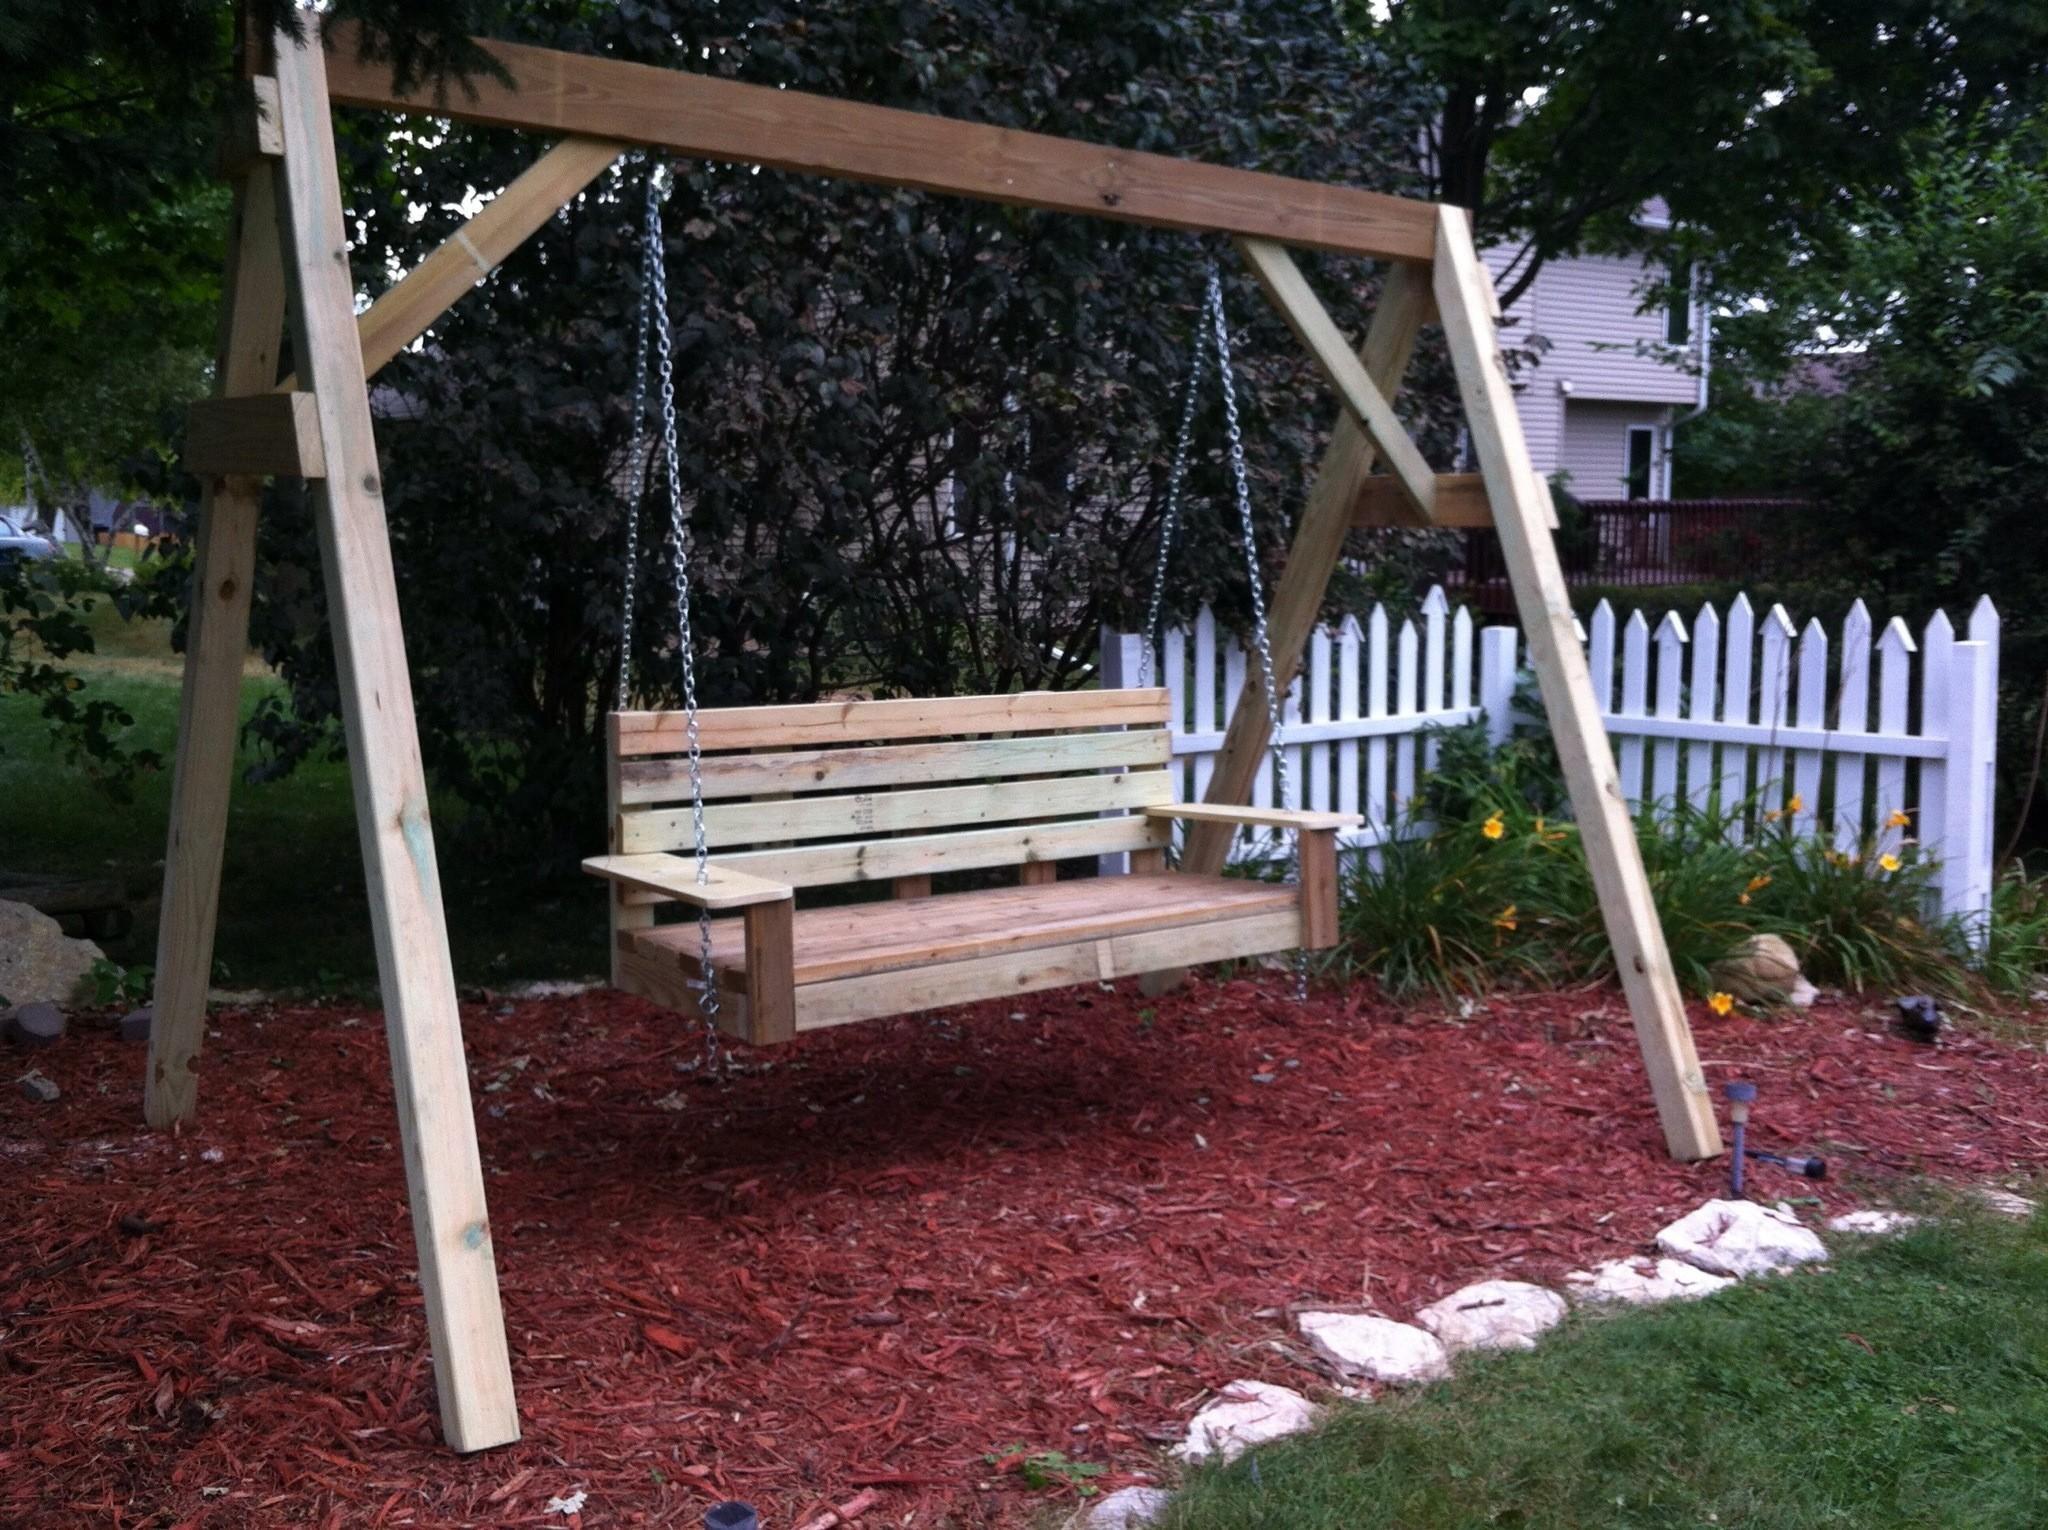 39 Elegant Diy Outdoor Swings That No One Can Resist Photo Gallery Decoratorist